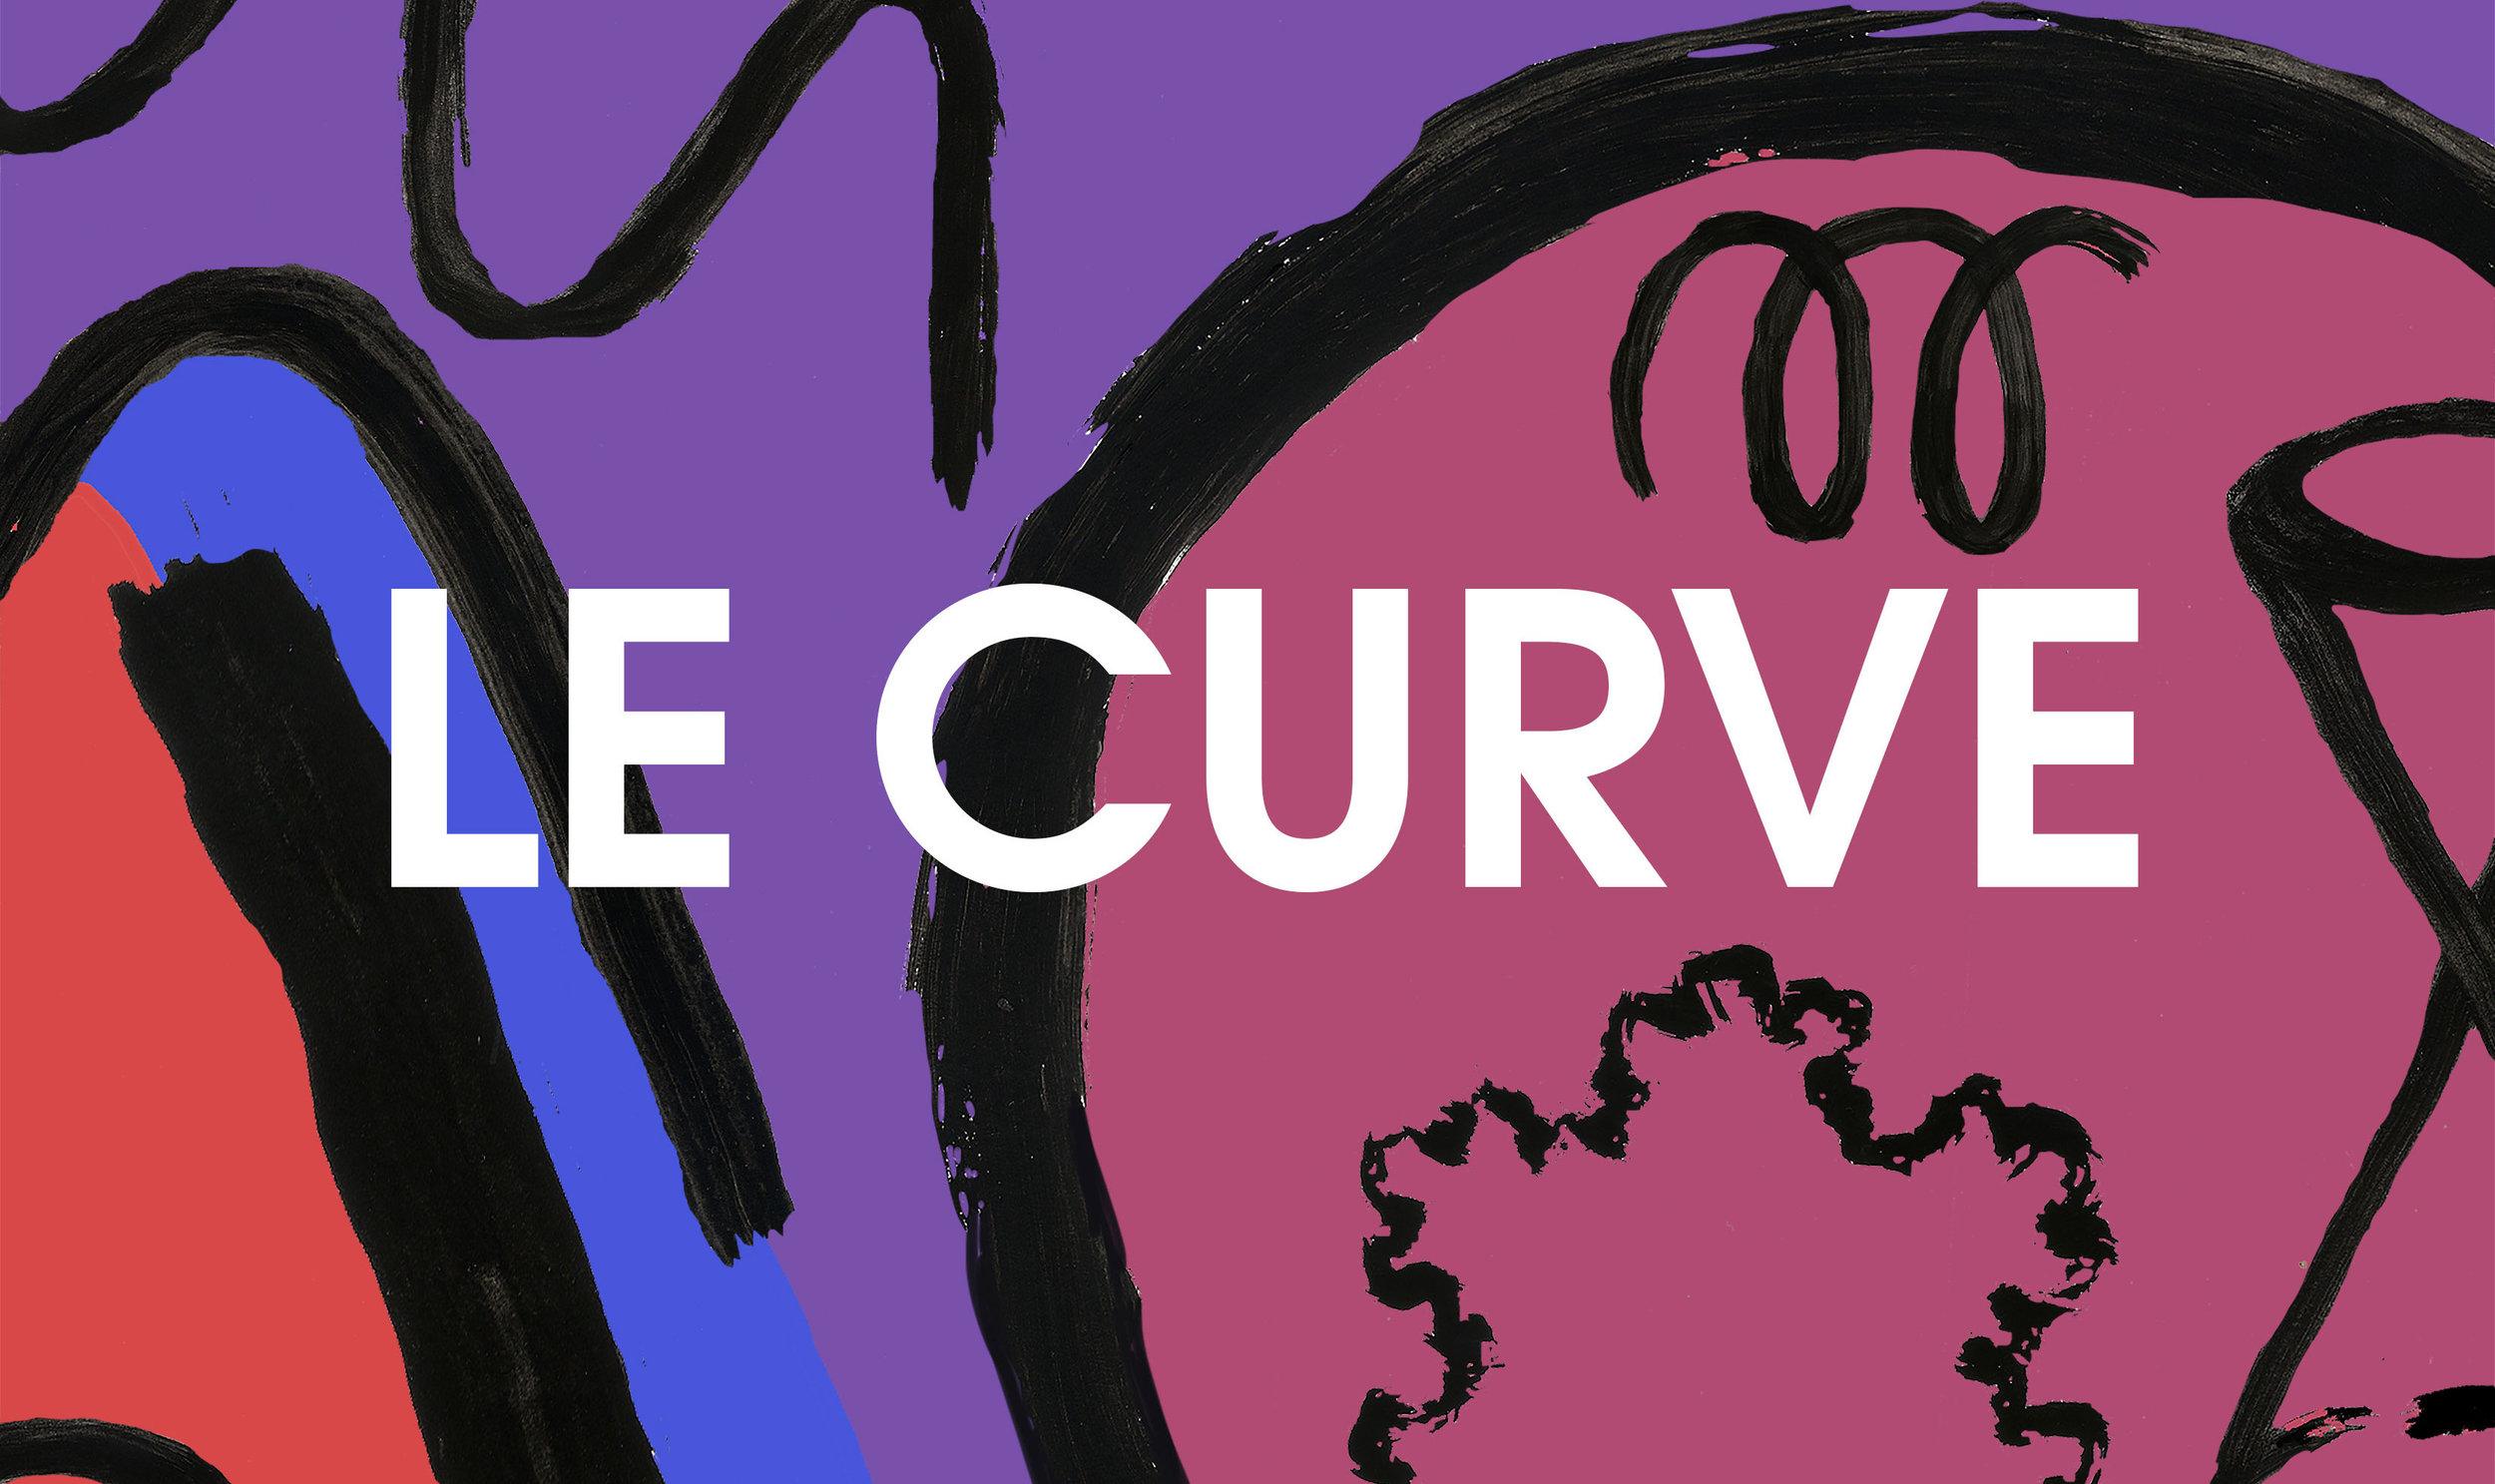 Le Curve